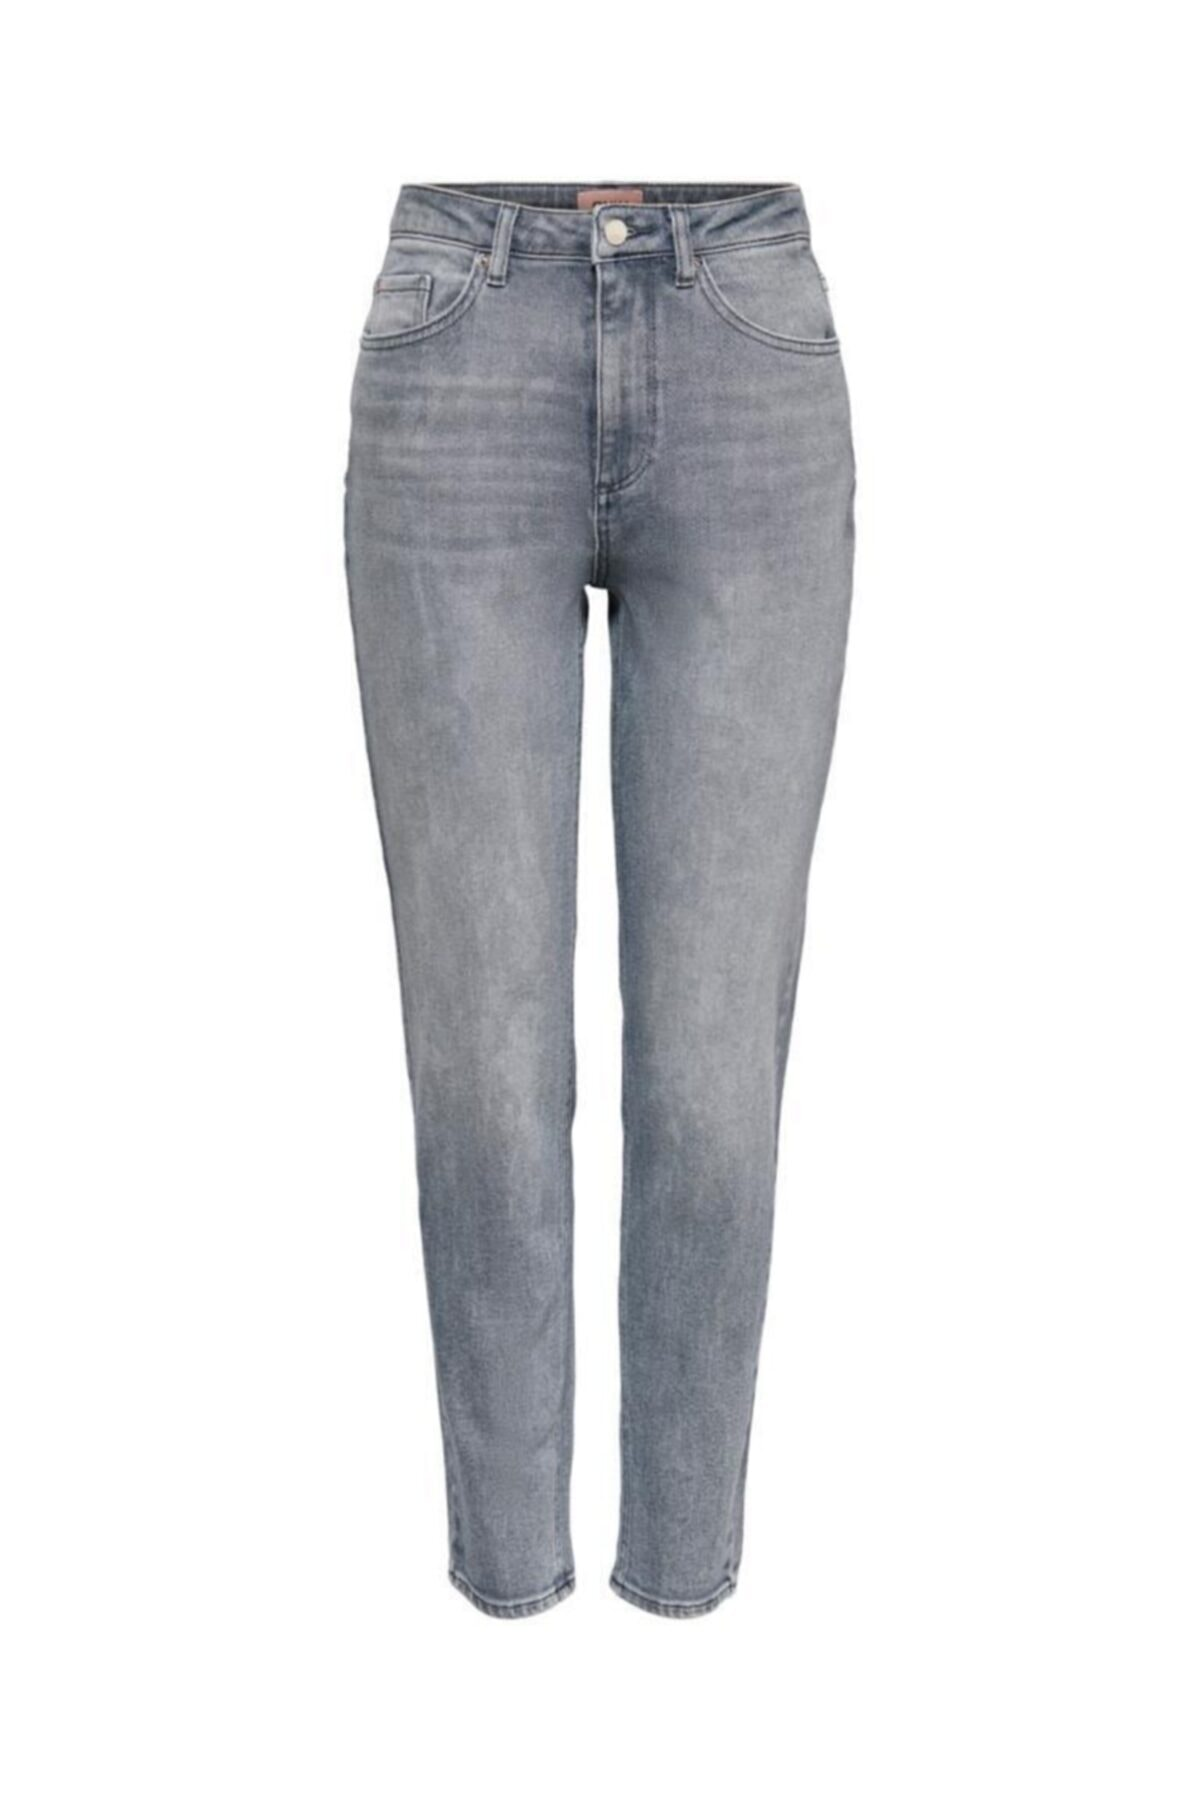 Only Veneda Lıfe Kadın Mom Jeans 1